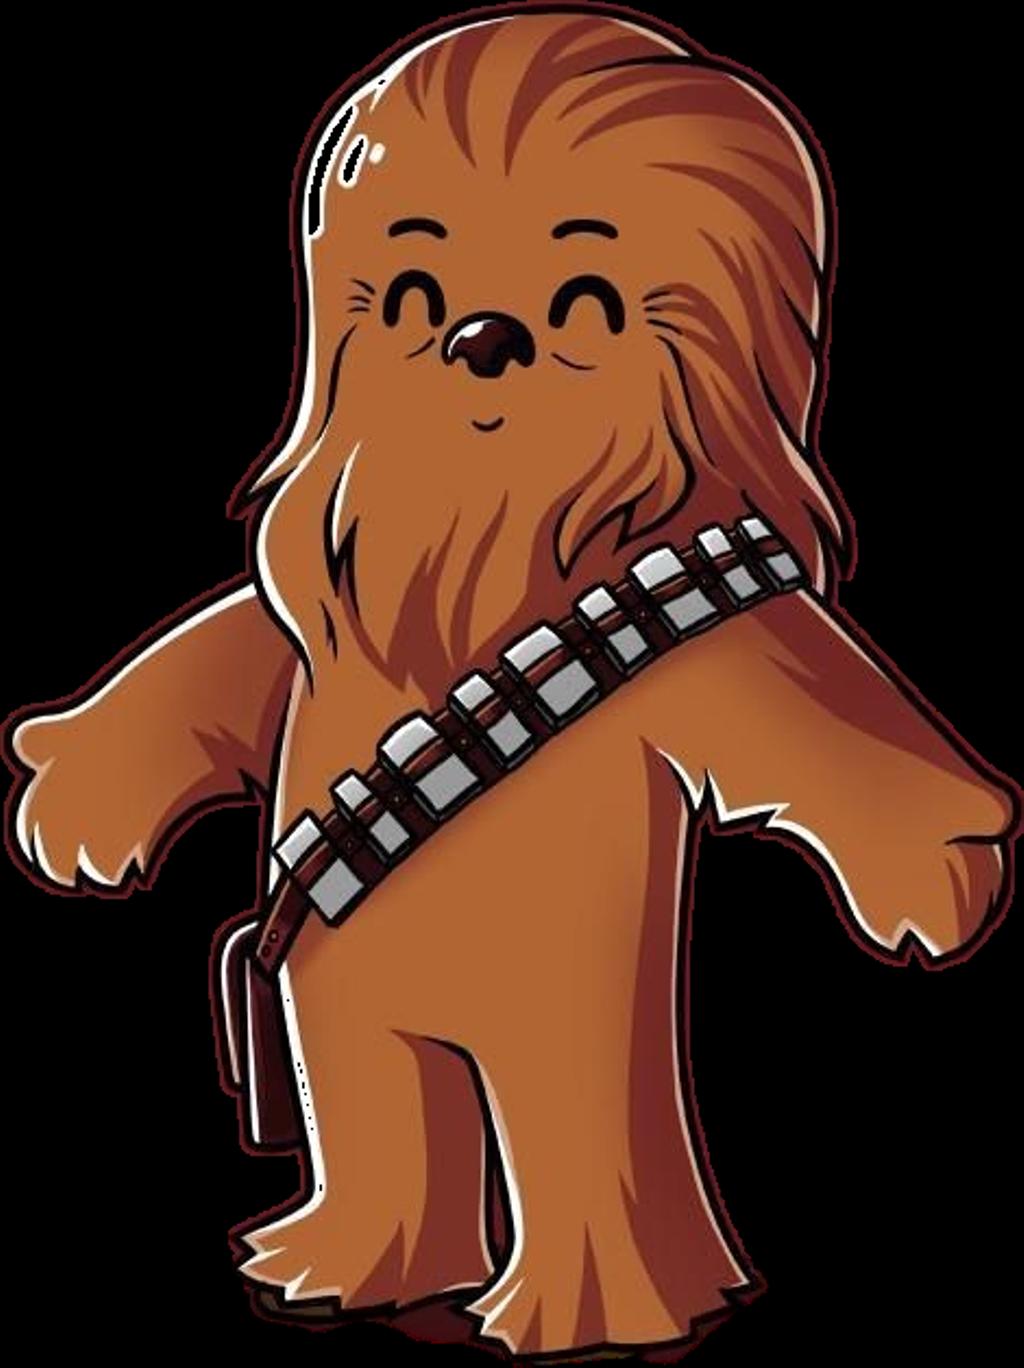 Chewbacca clipart chibi. Starwars chubaca chubaka star